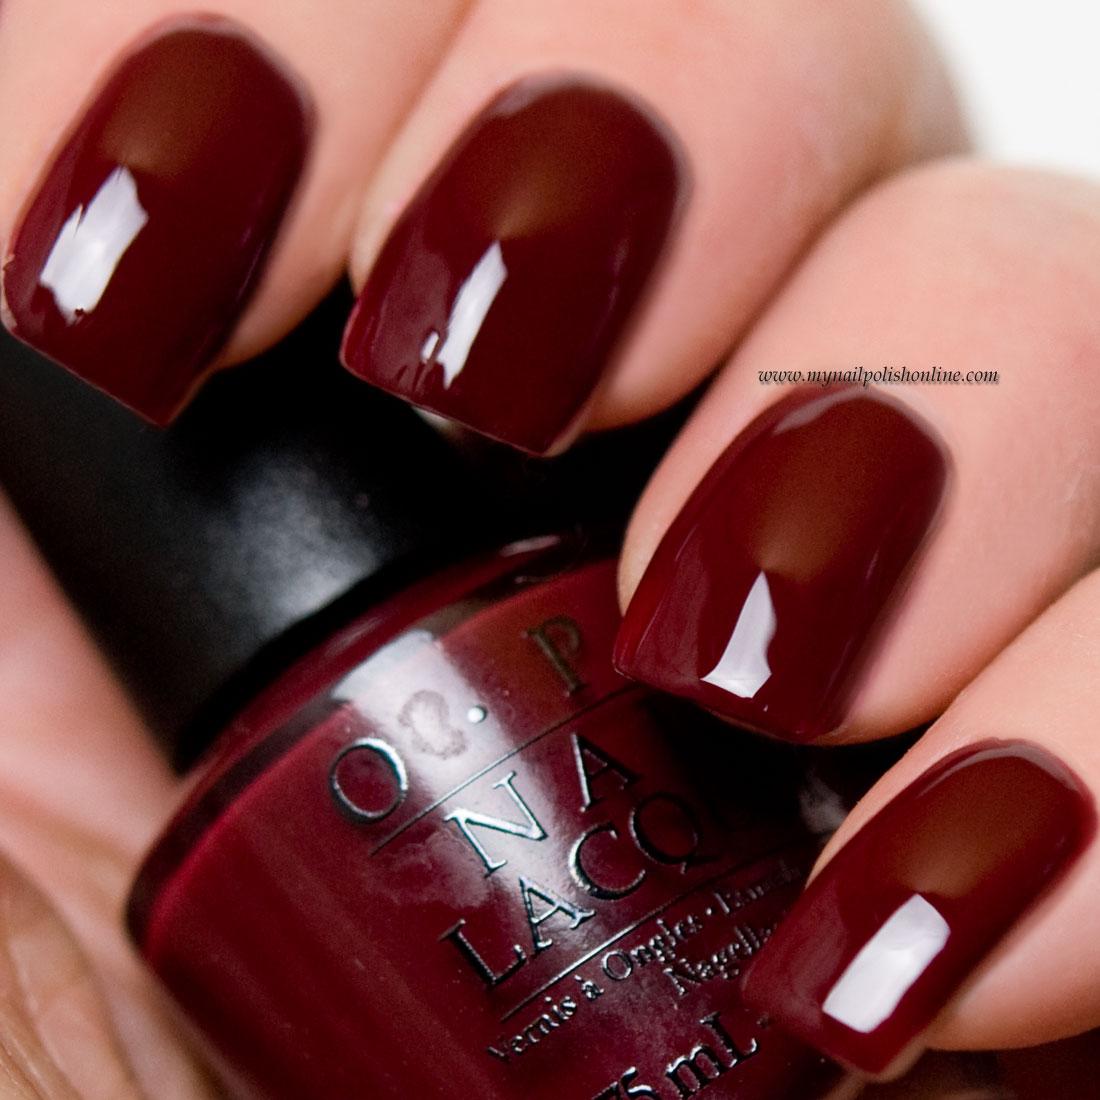 OPI - Malaga Wine - My Nail Polish Online